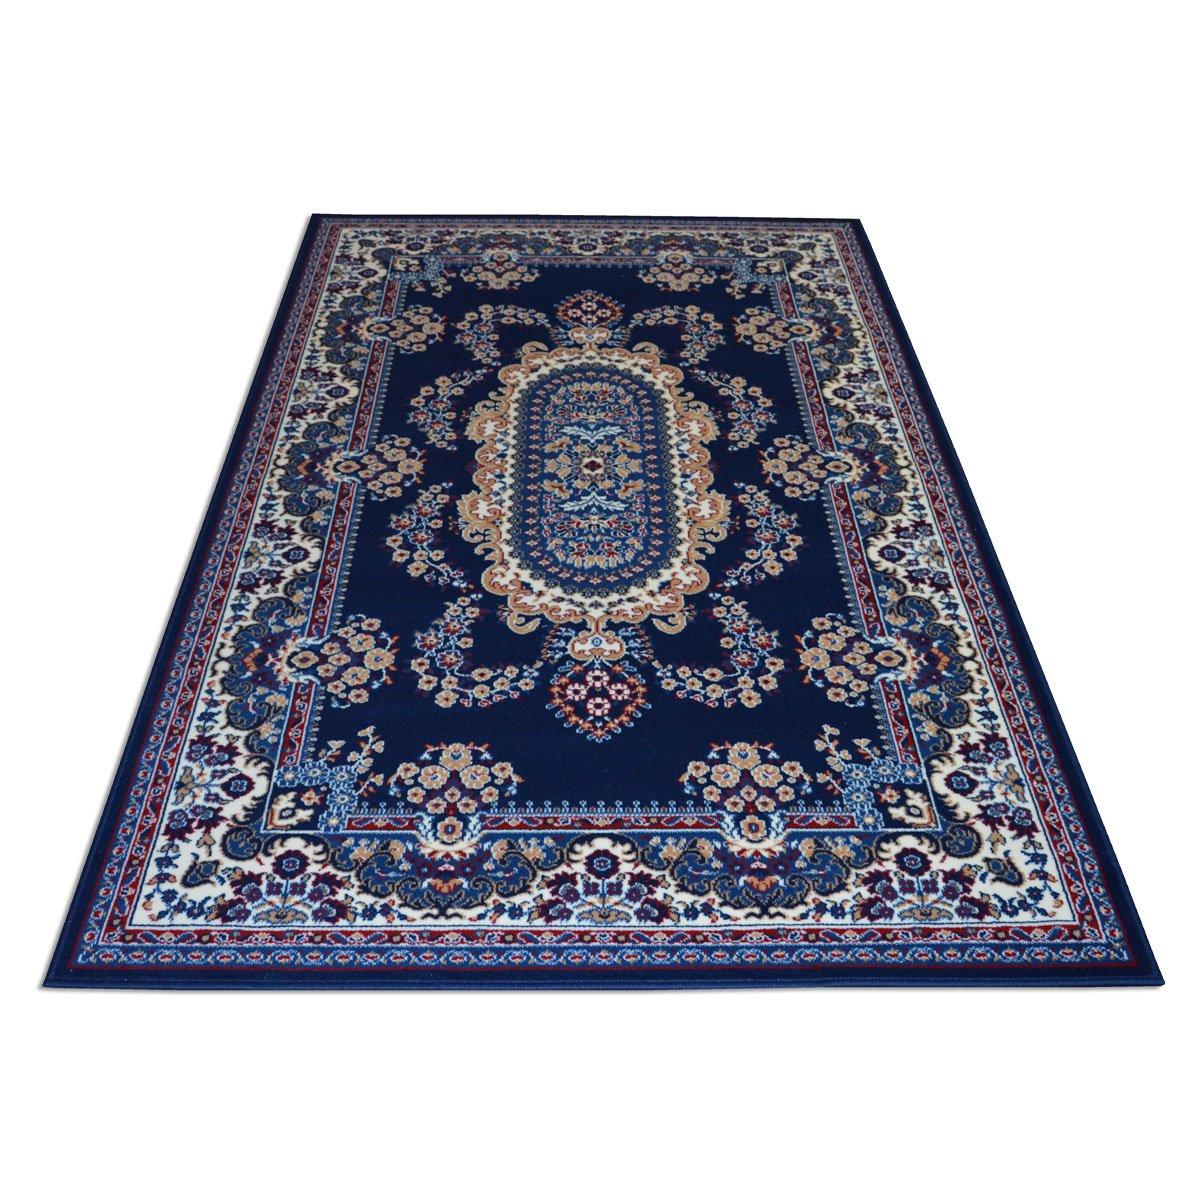 WEBTAPPETI Klassisch Teppich - Orient Teppiche - Teppich Living - ROYAL Shiraz 2063-Blau 140x210